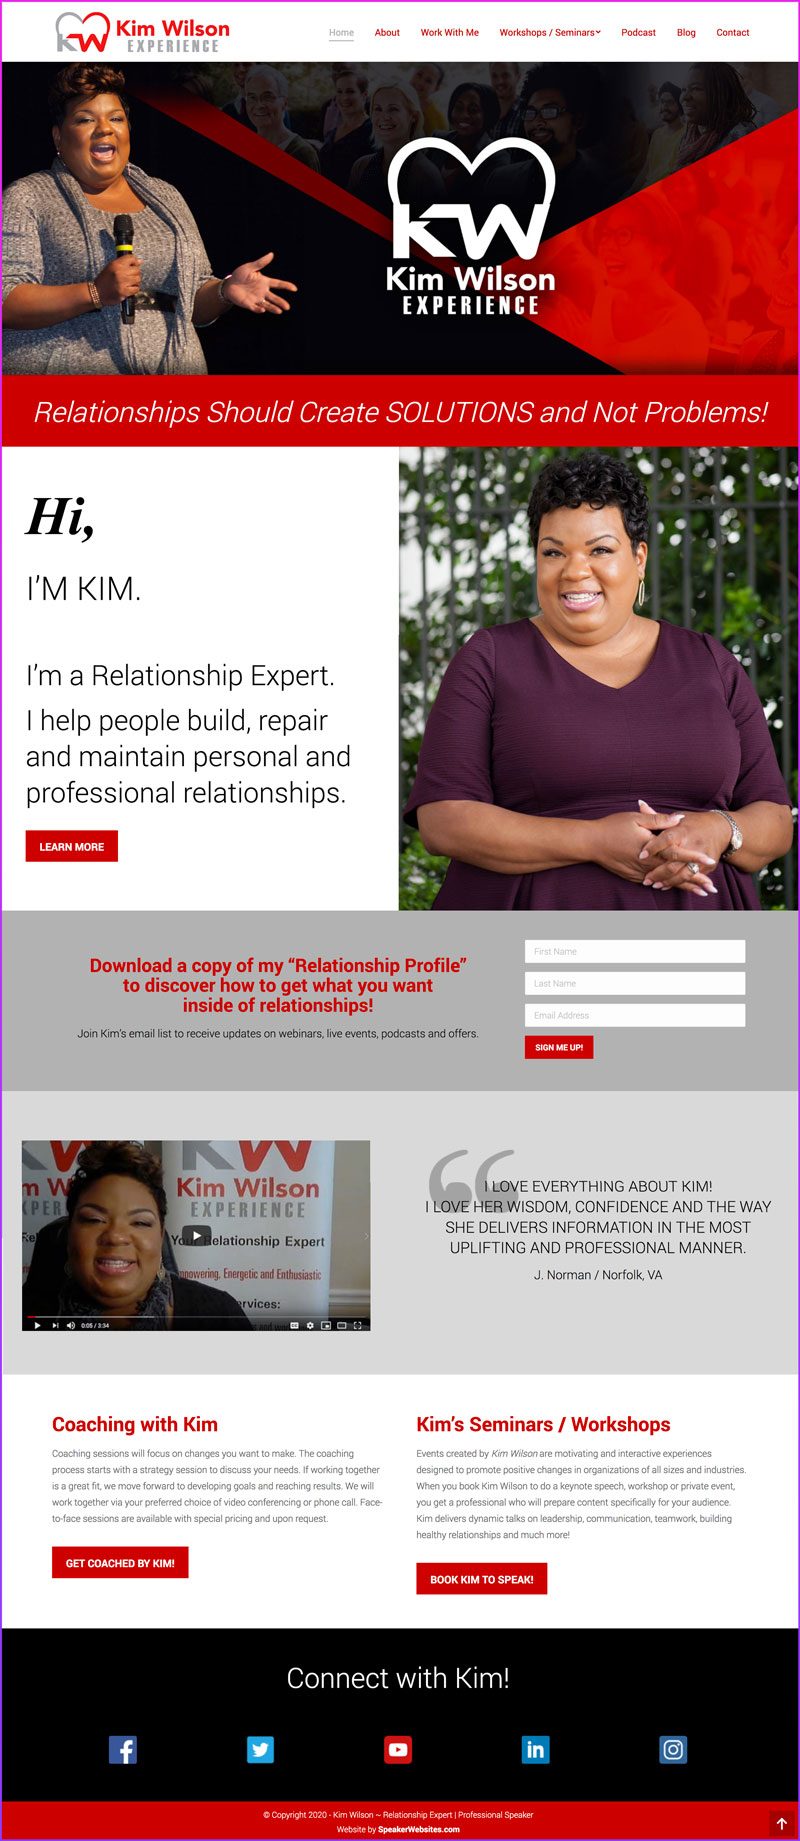 Kim Wilson - Professional Speaker & Relationship Coach